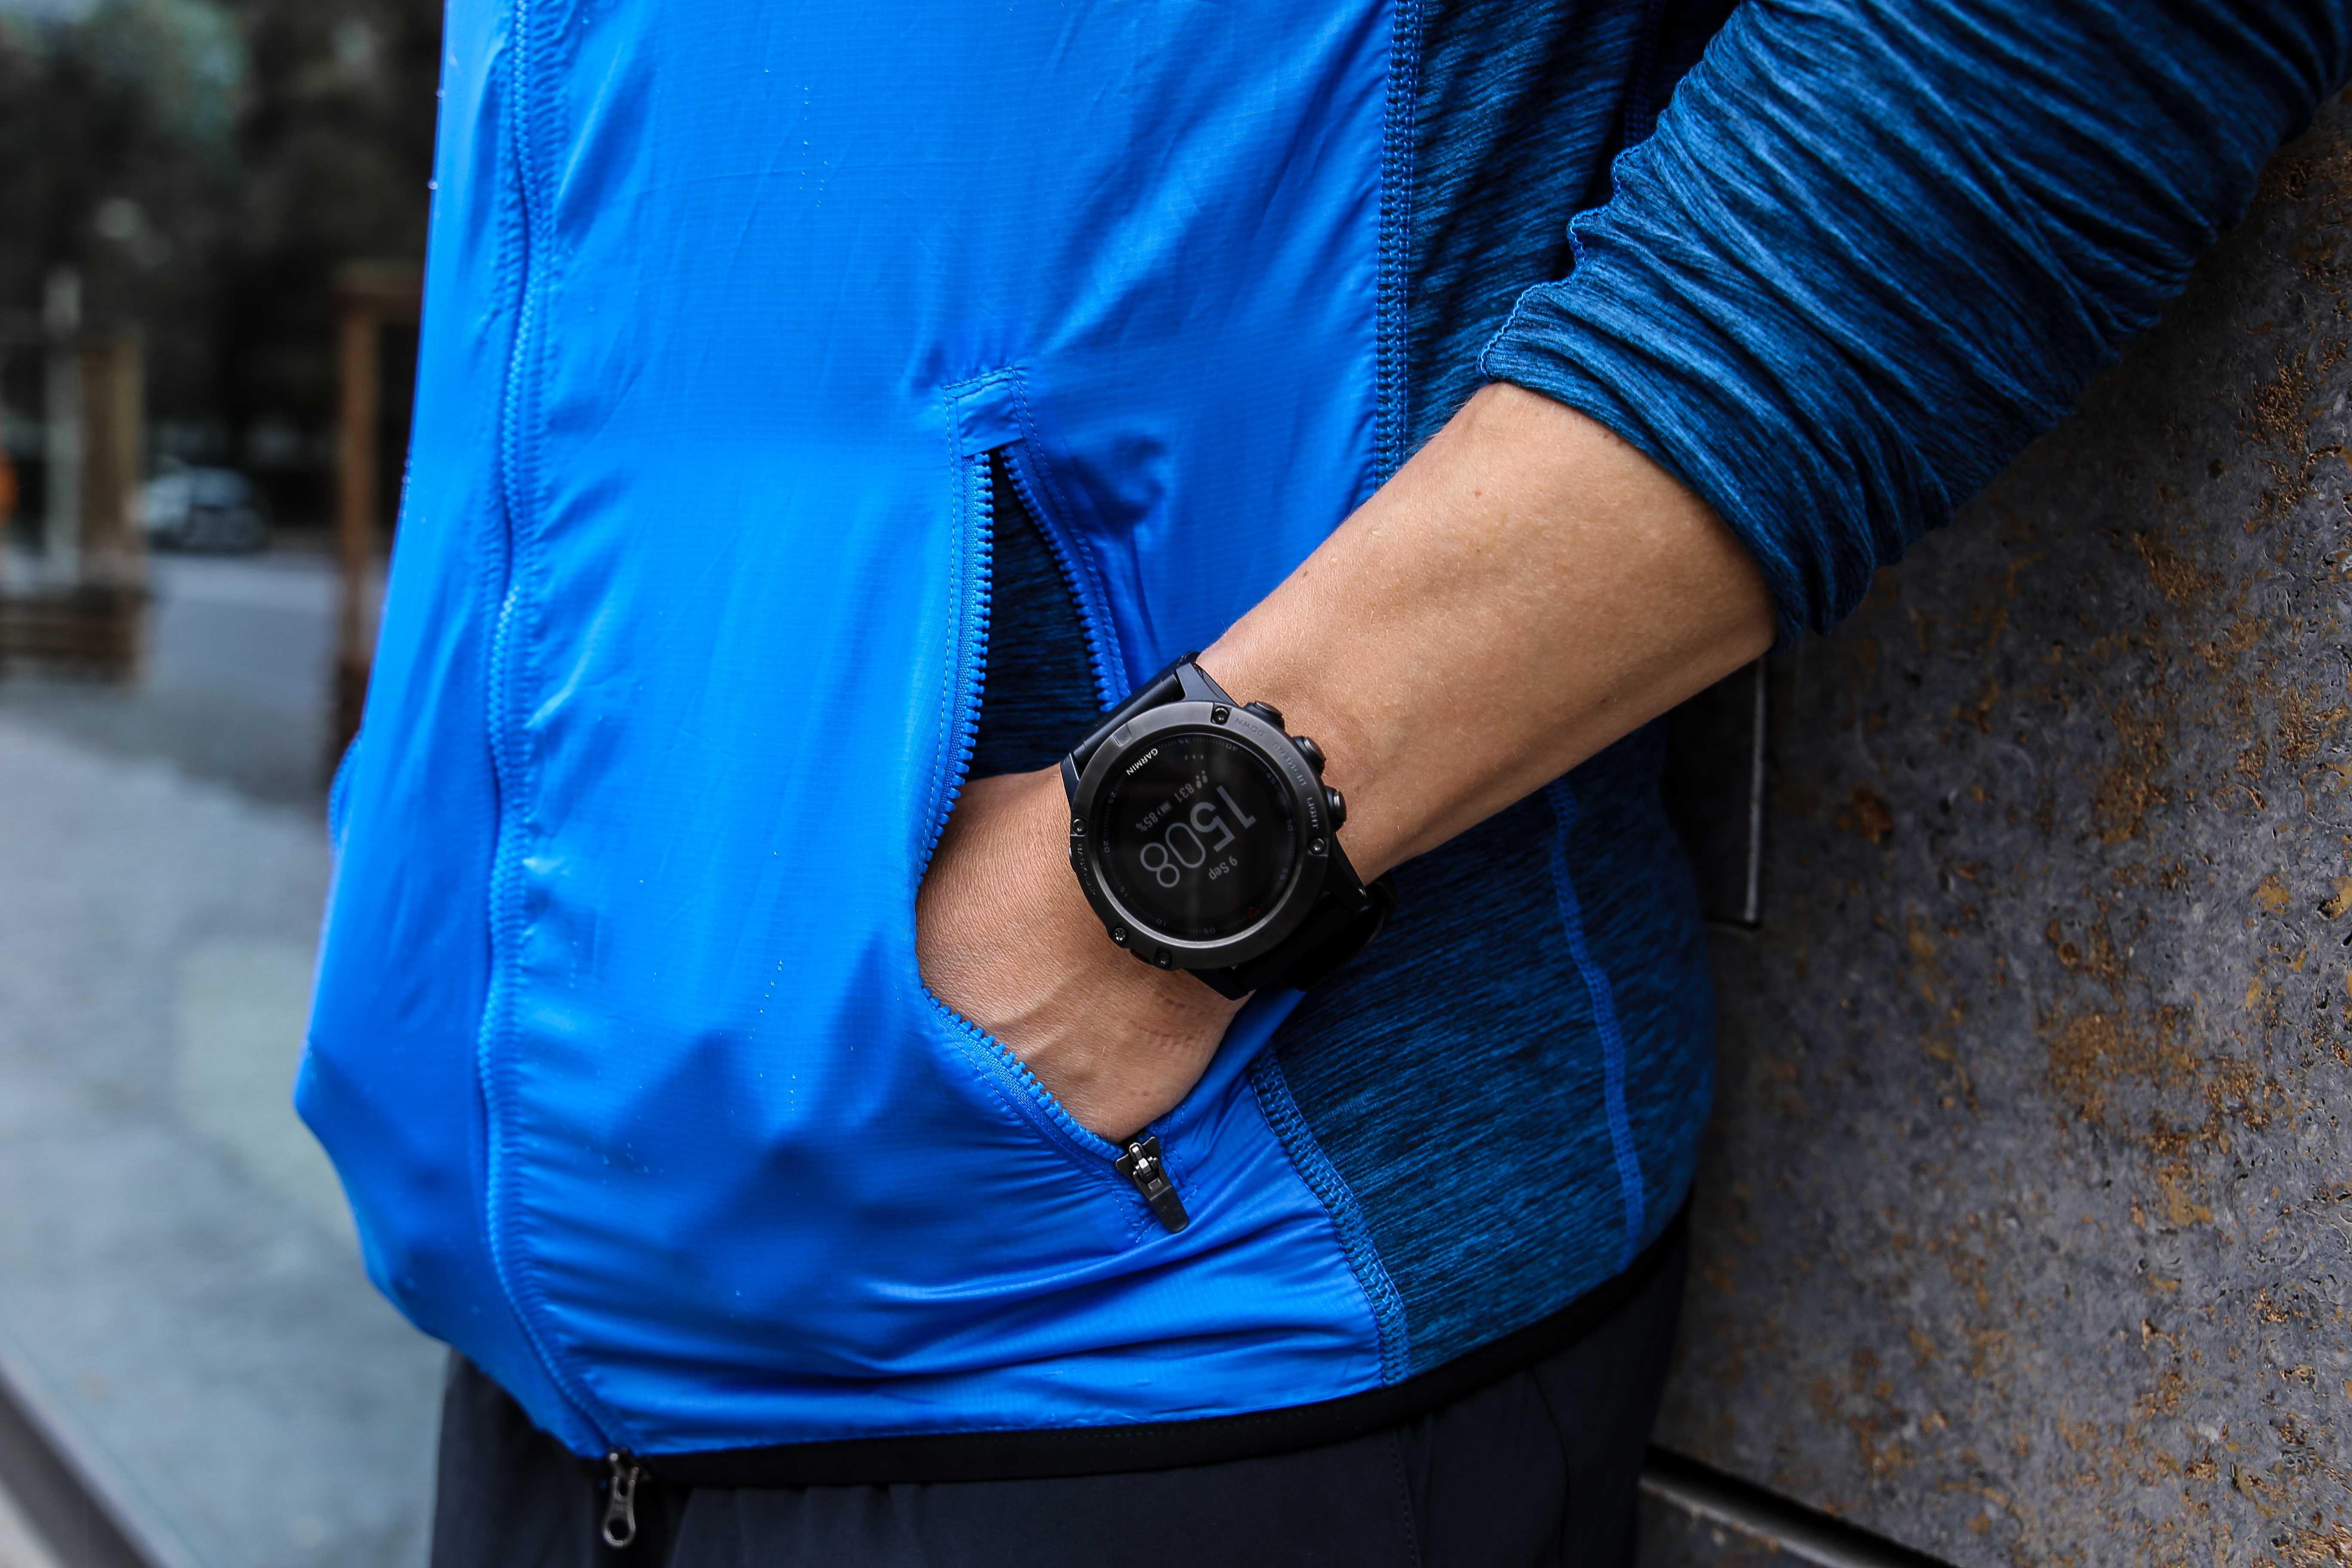 multisport-uhr-garmin-fenix-5x-sportuhr-fitness-tracker-sport-fitness-blogger_0358